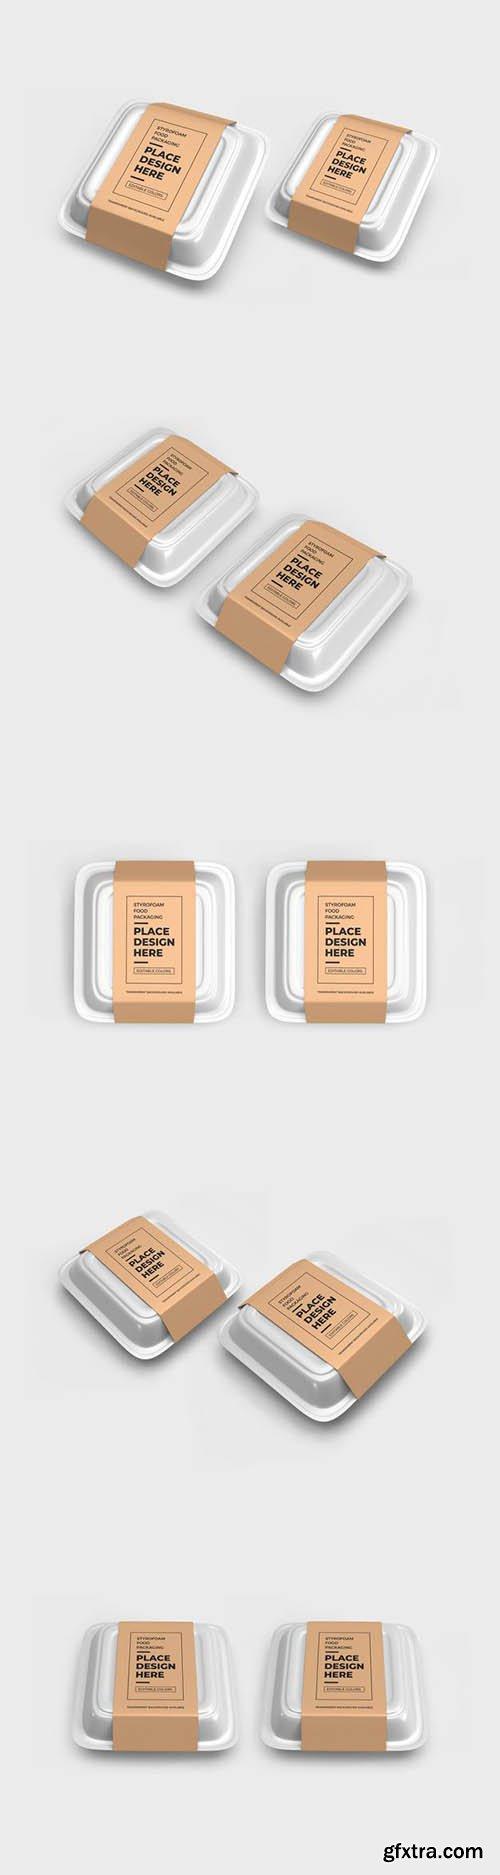 Styrofoam food box packaging mockup